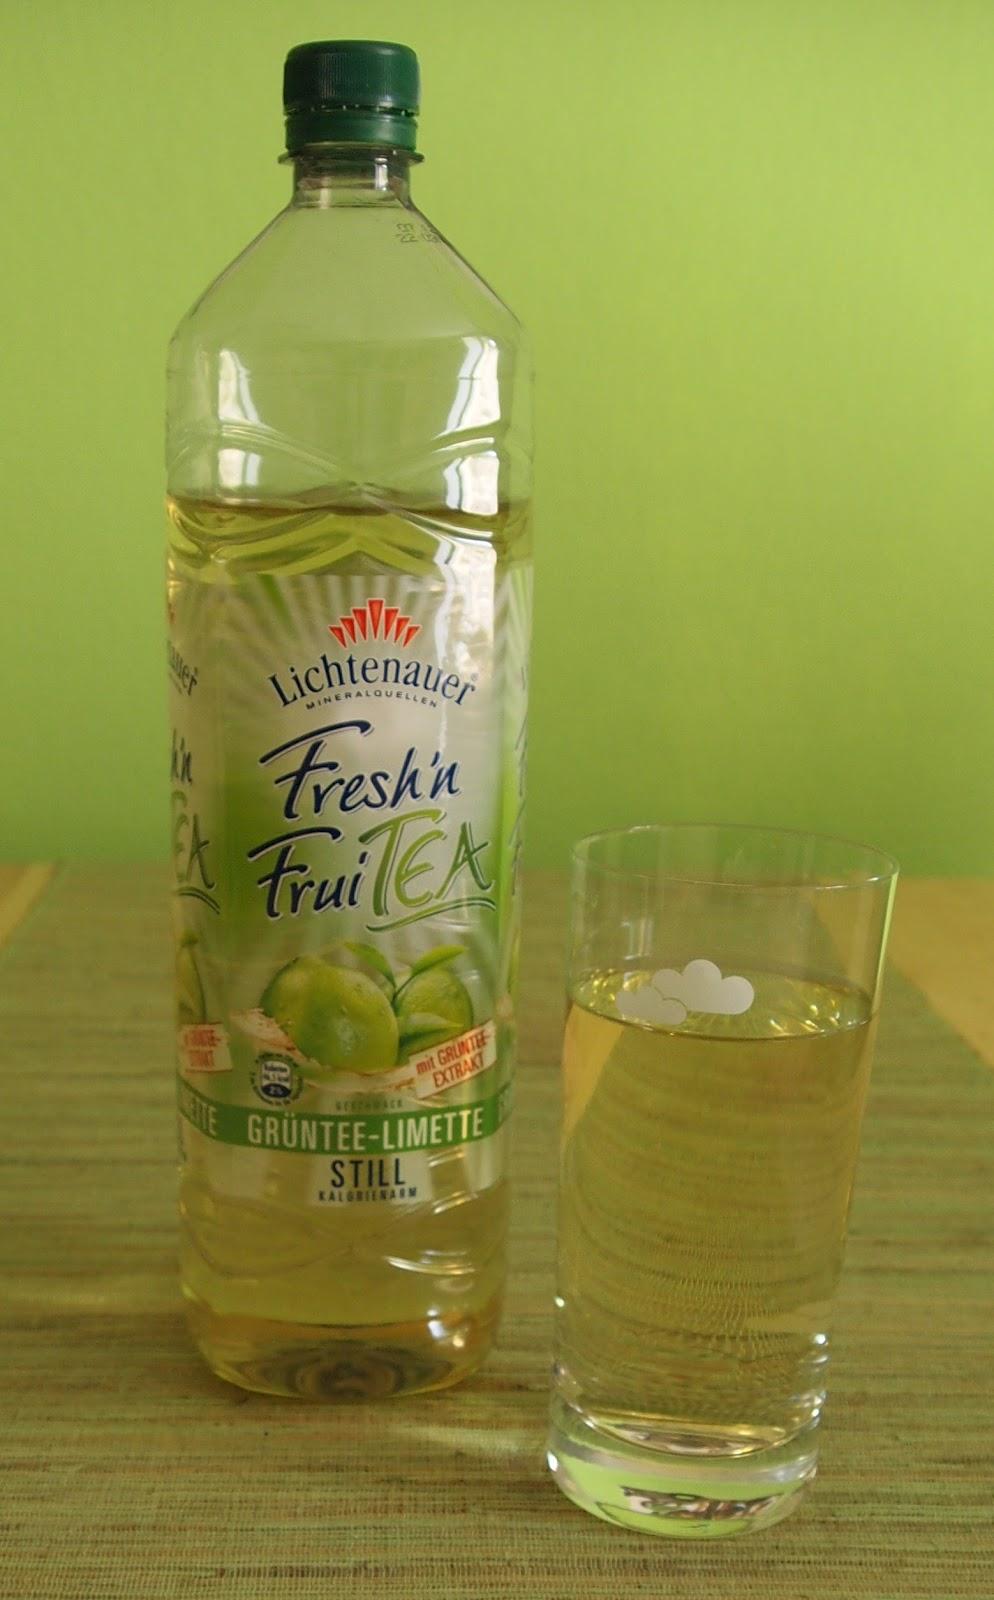 TestTestHurra: Lichtenauer Fresh`n Fruitea